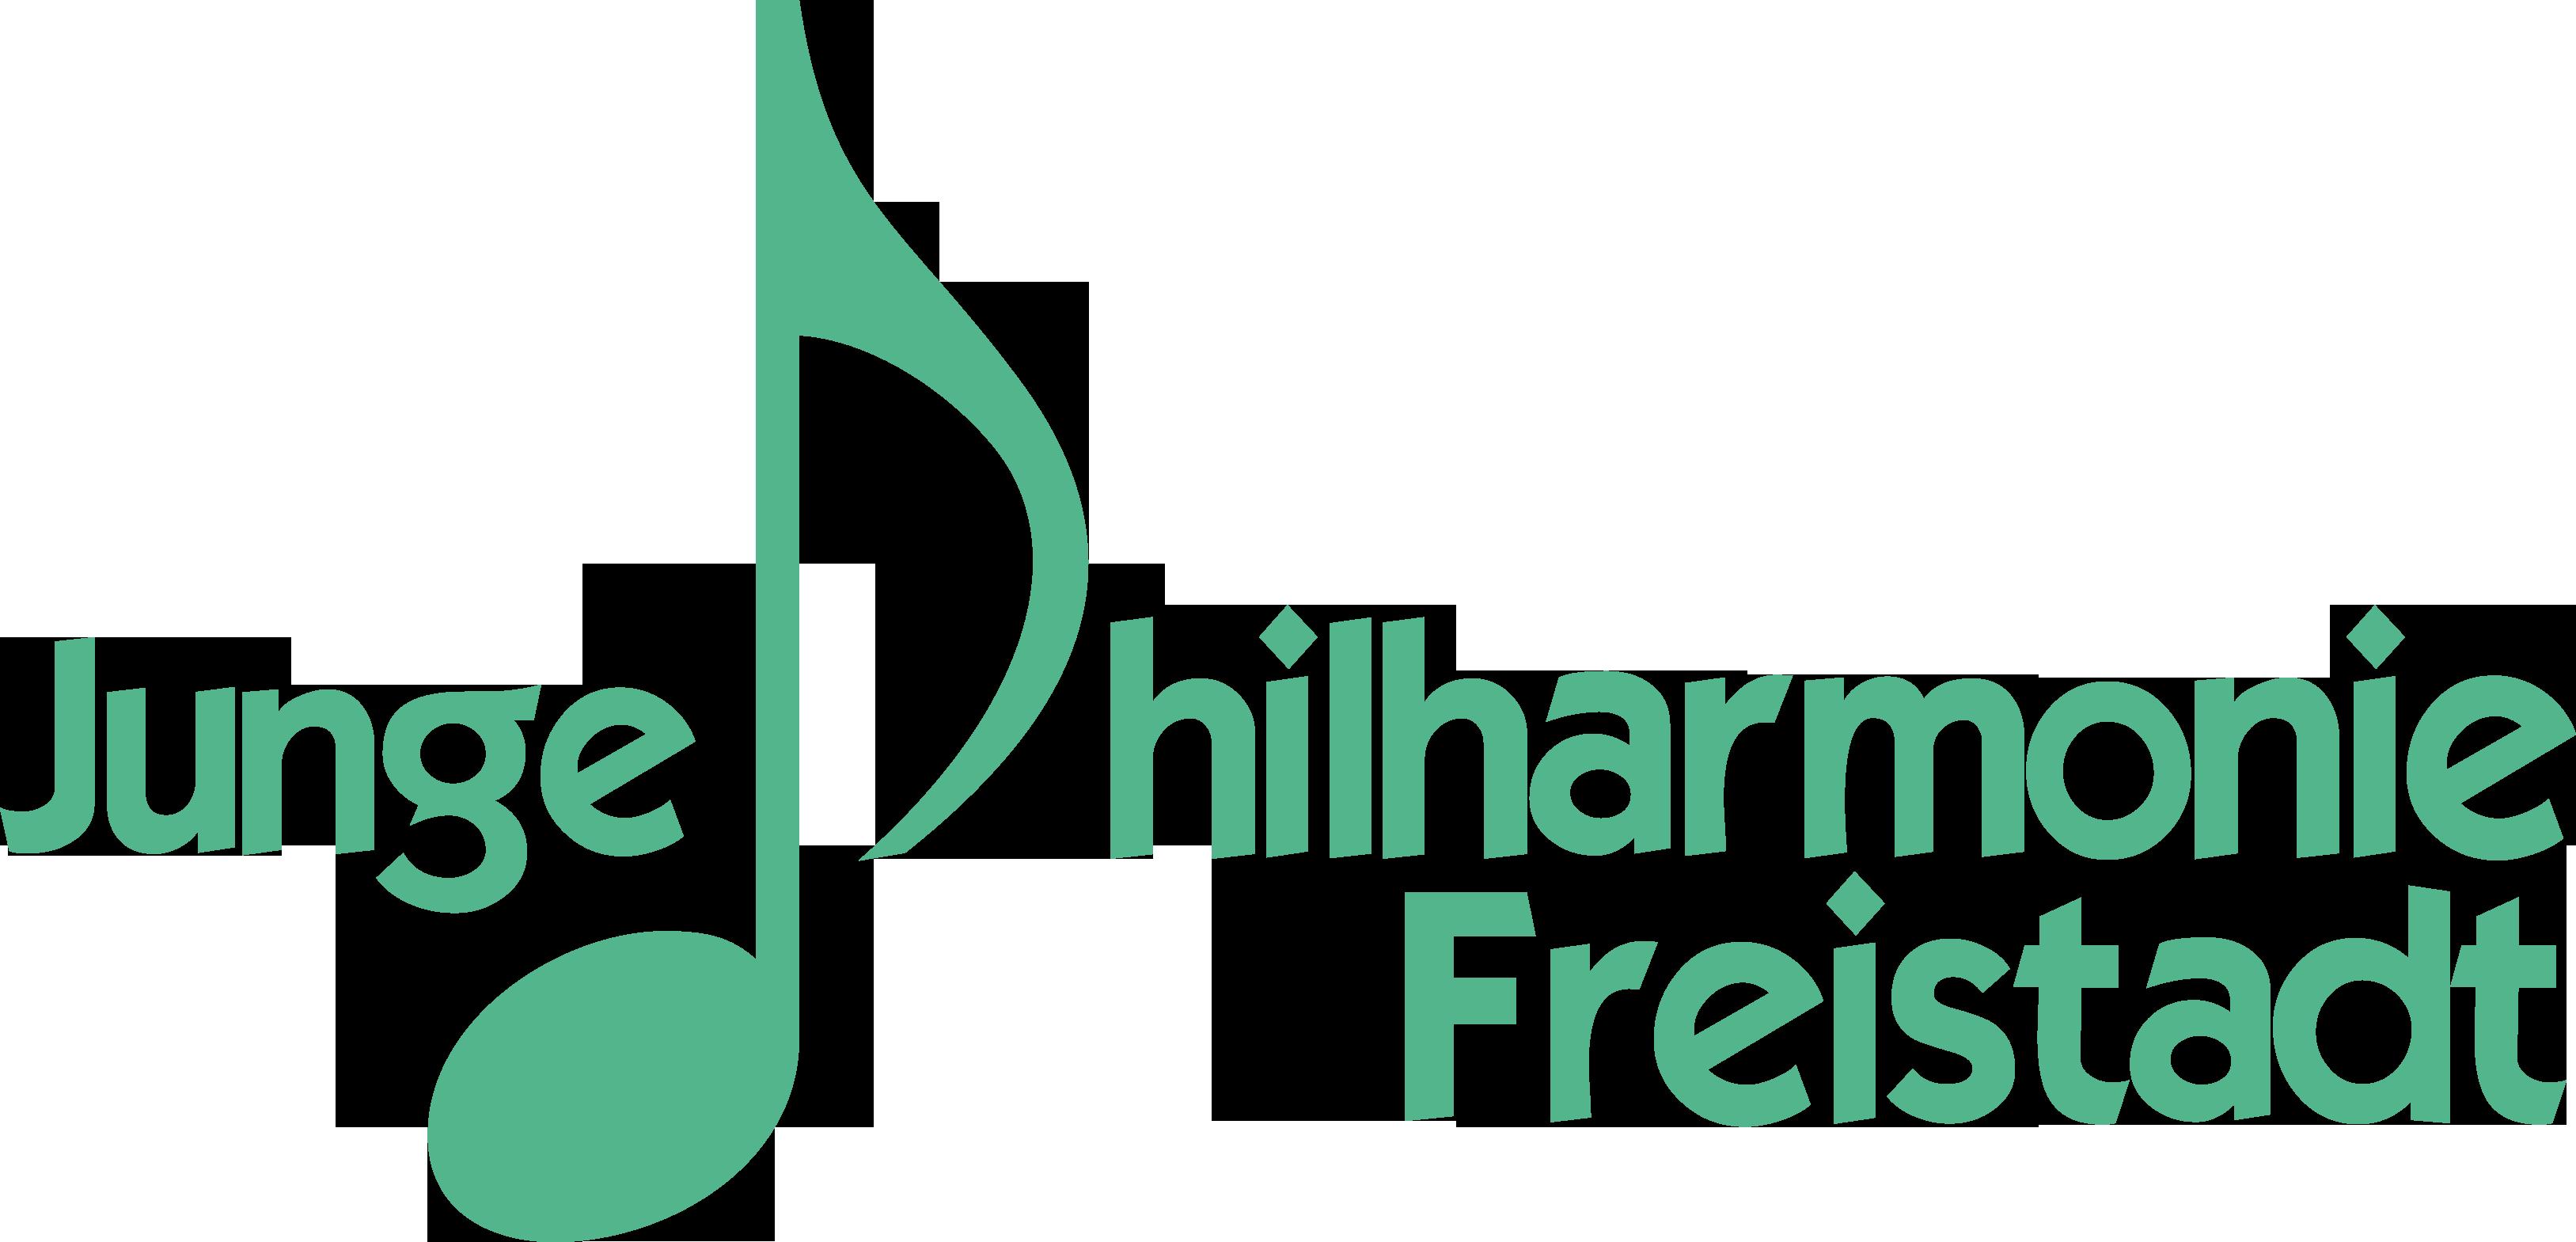 Junge Philharmonie Freistadt